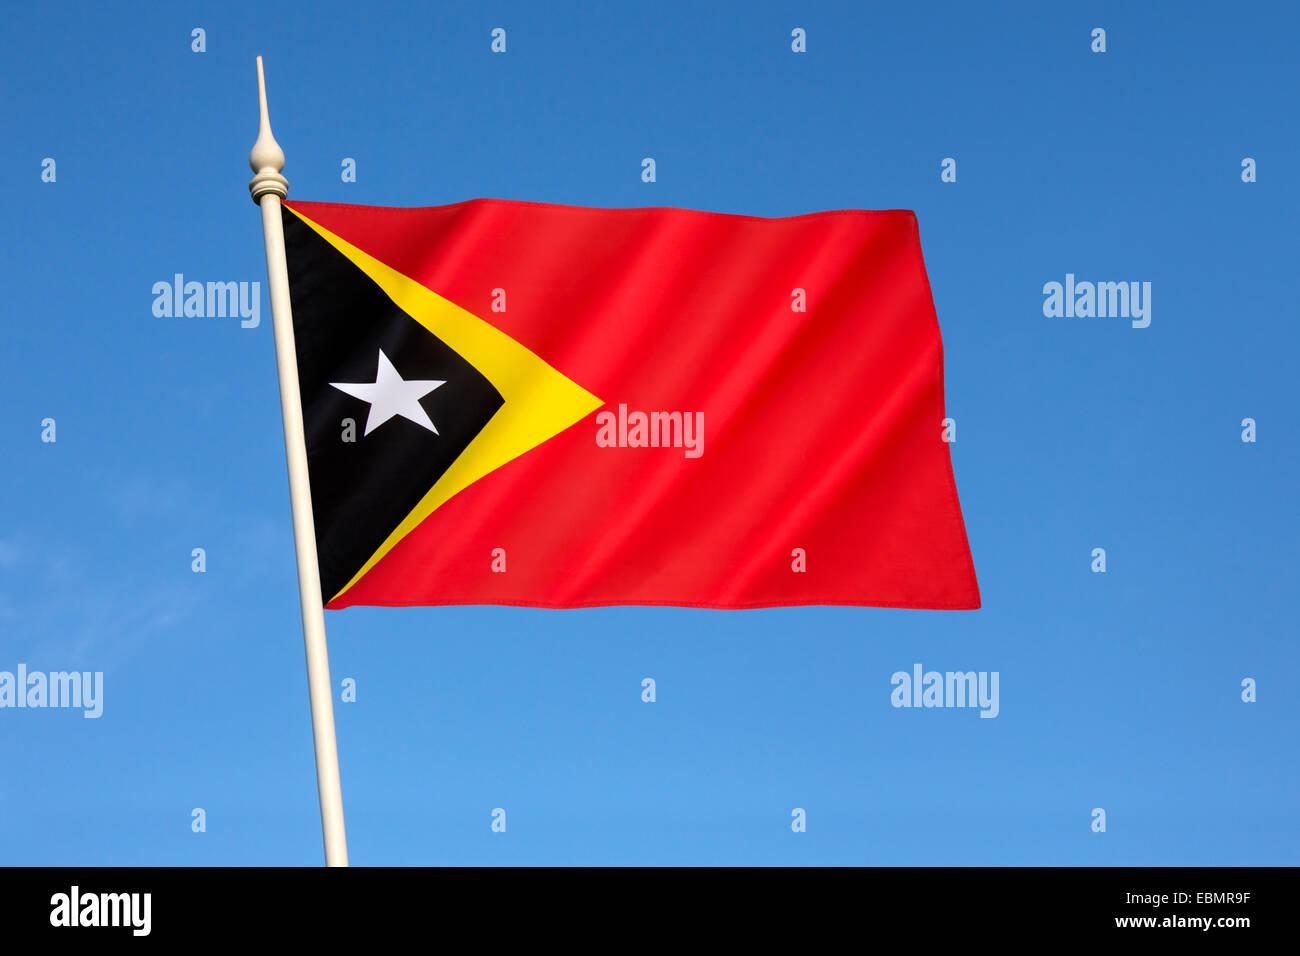 Flag of the Democratic Republic of Timor-Leste - Stock Image